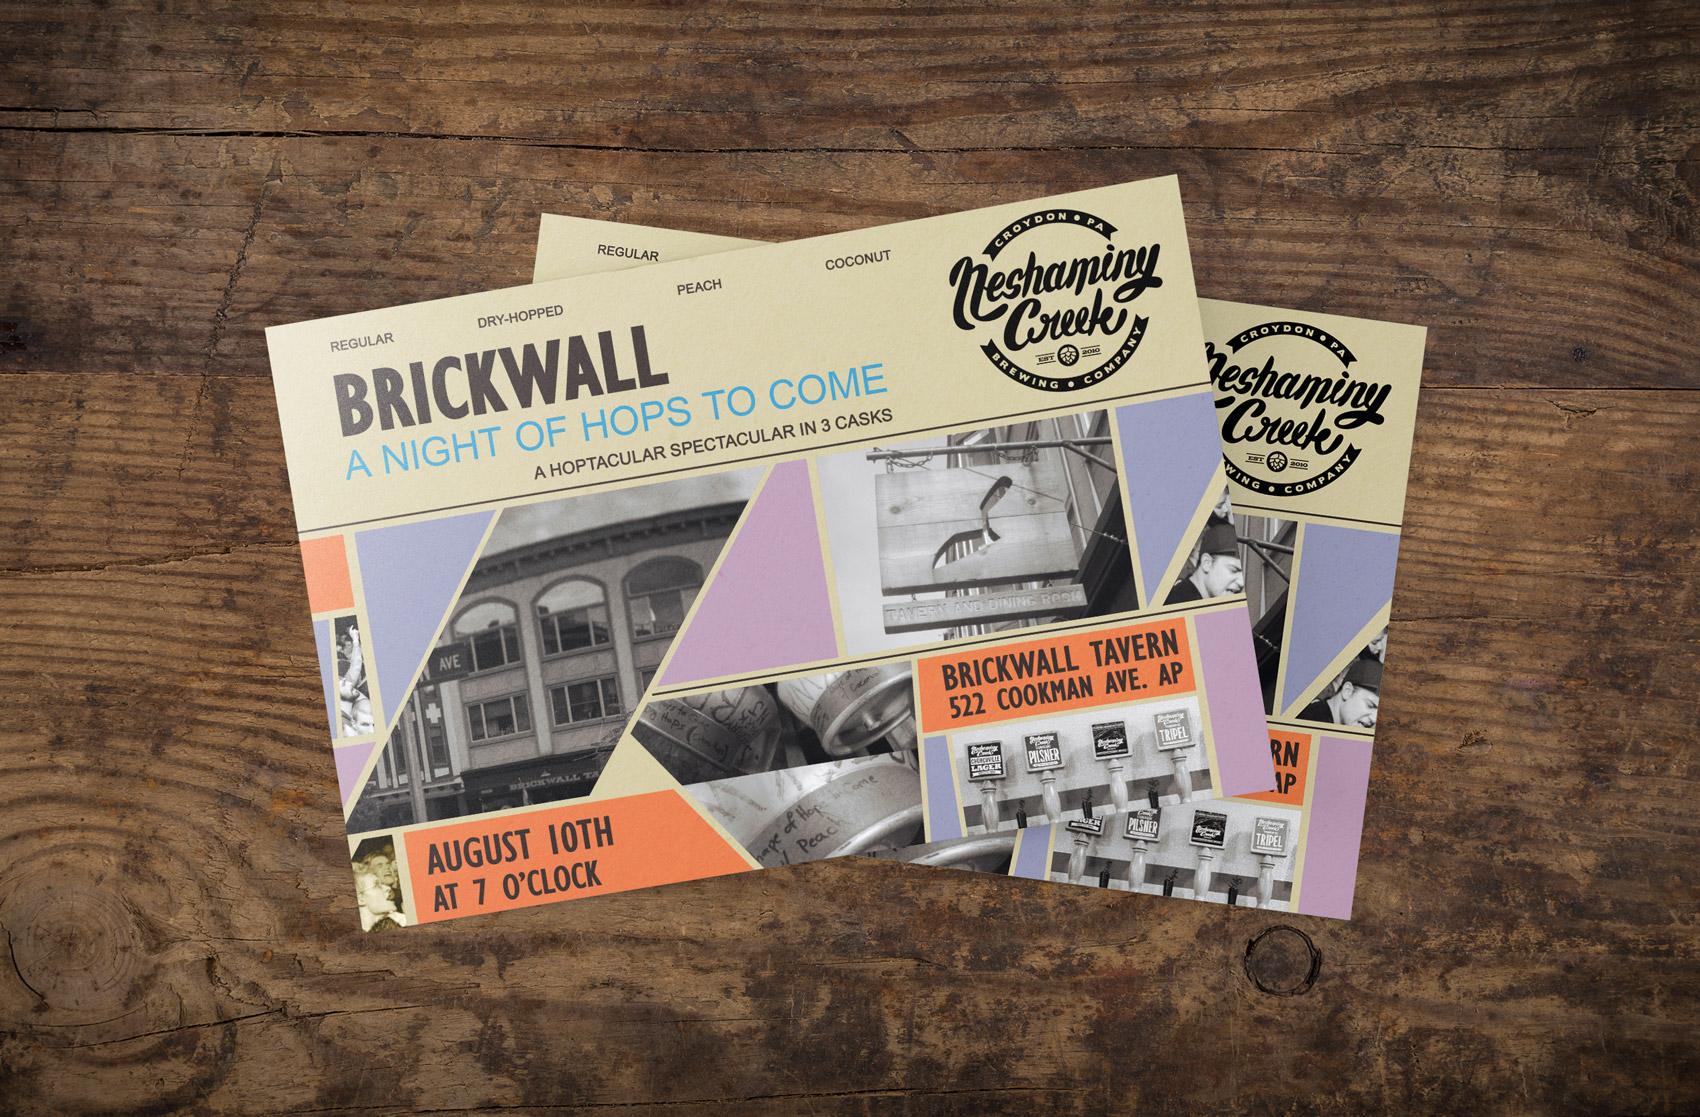 brickwall-AP-NCBC-night-of-hops-to-come-postcard-mockup